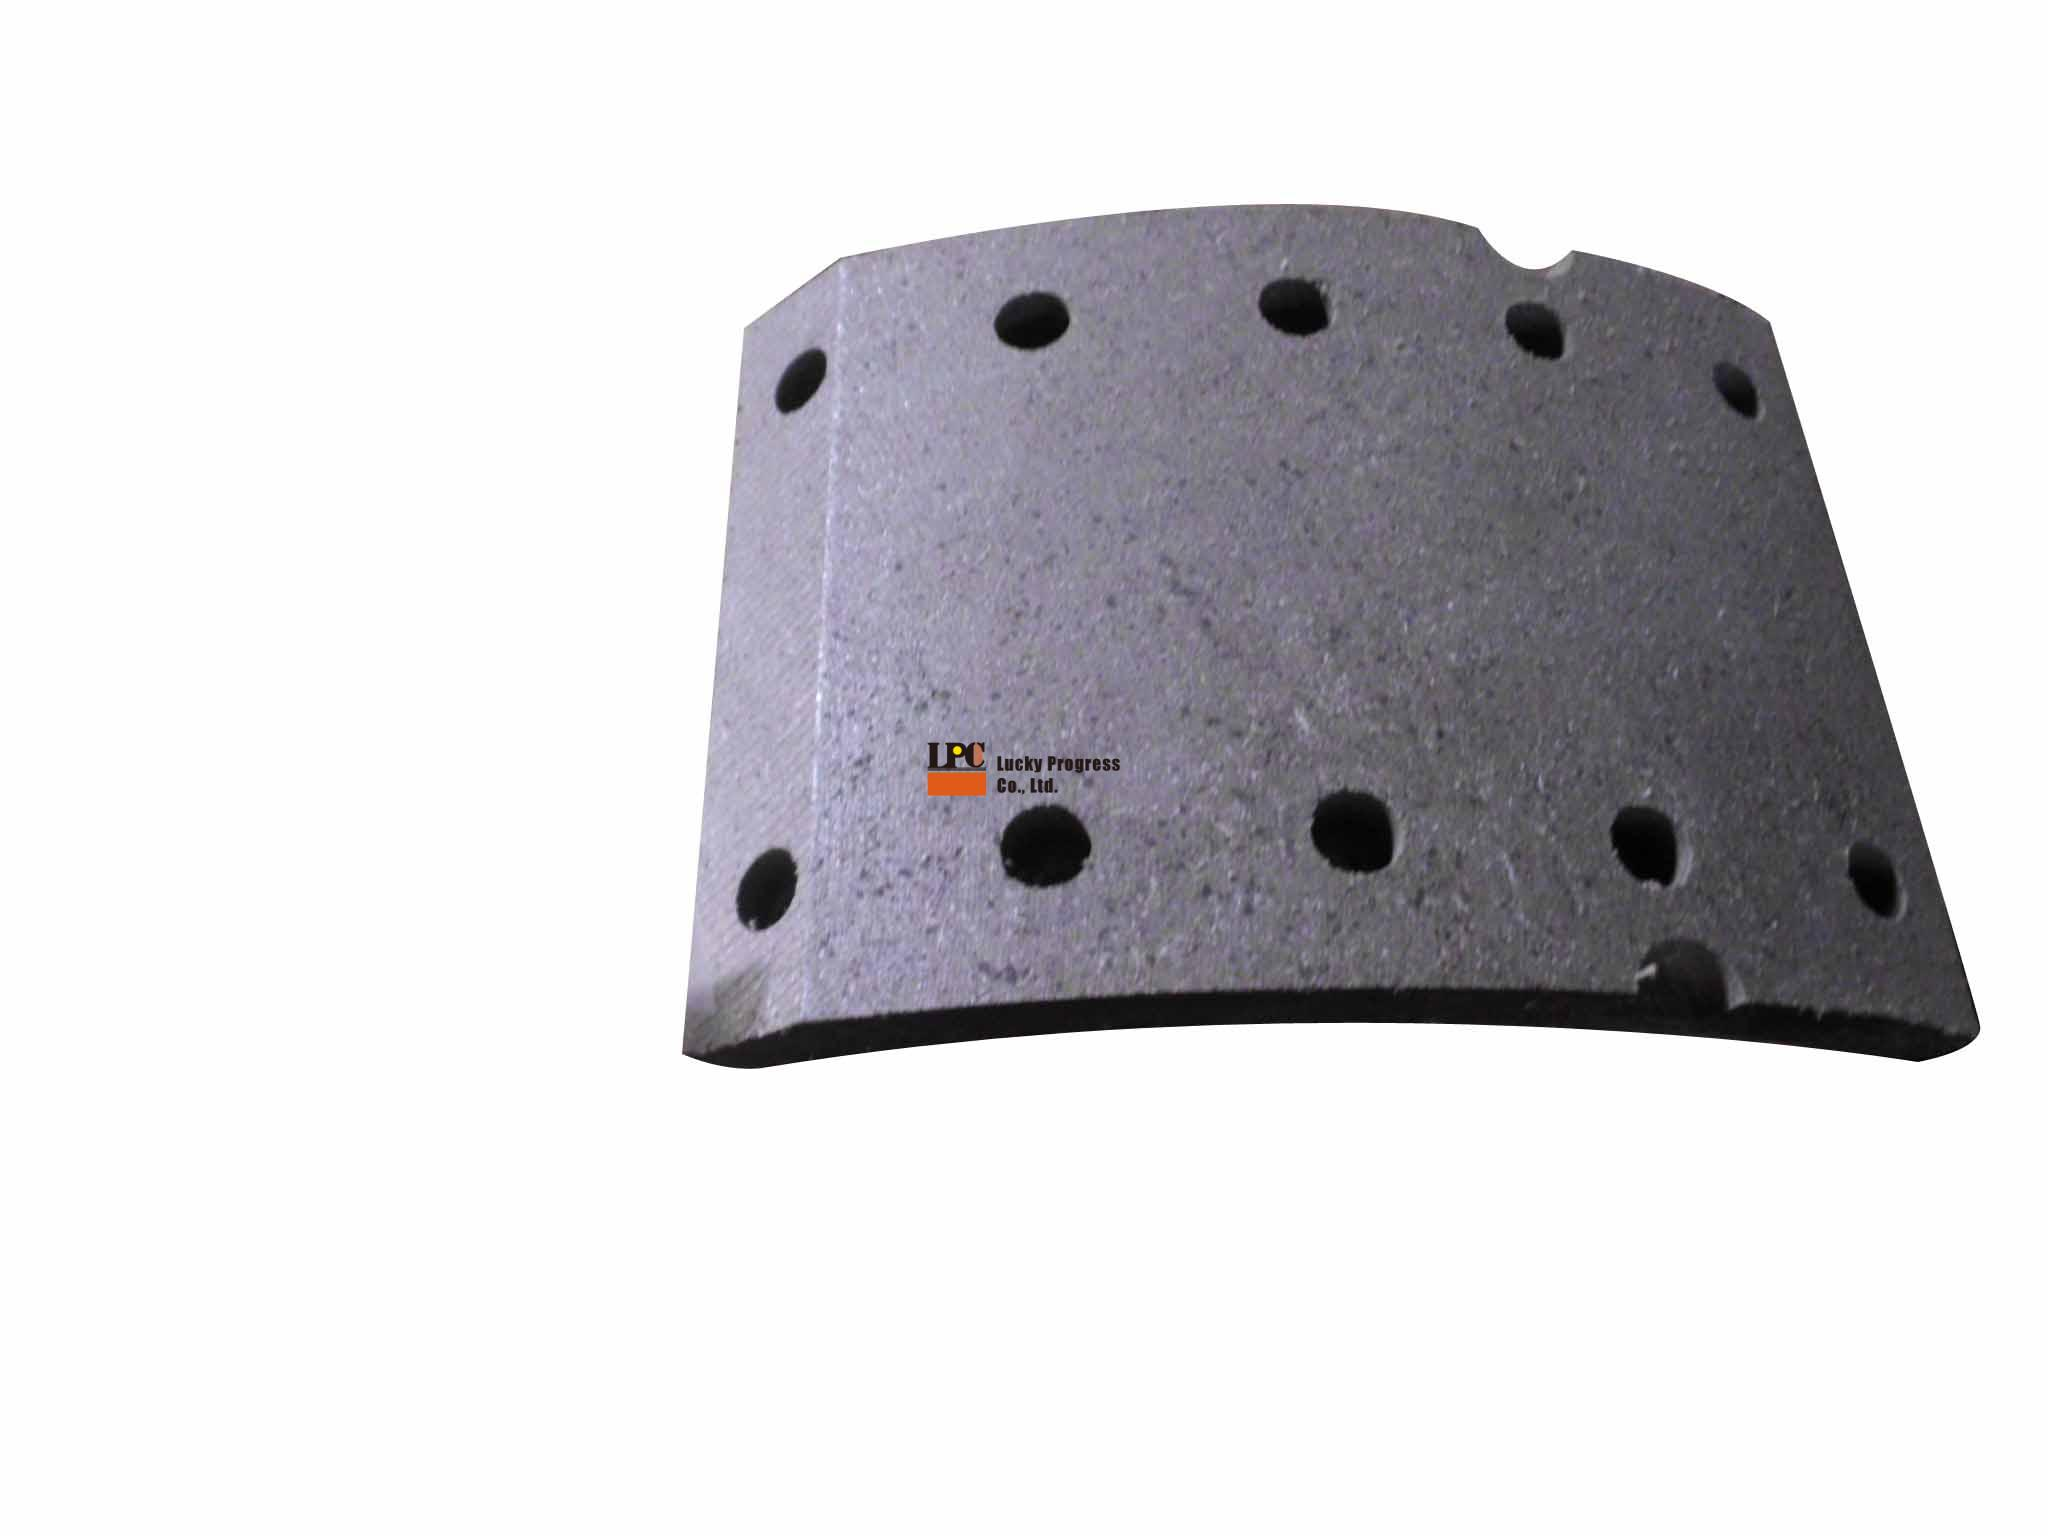 Air Brake Lining : Mitsubishi brake lining mc lucky progress co ltd